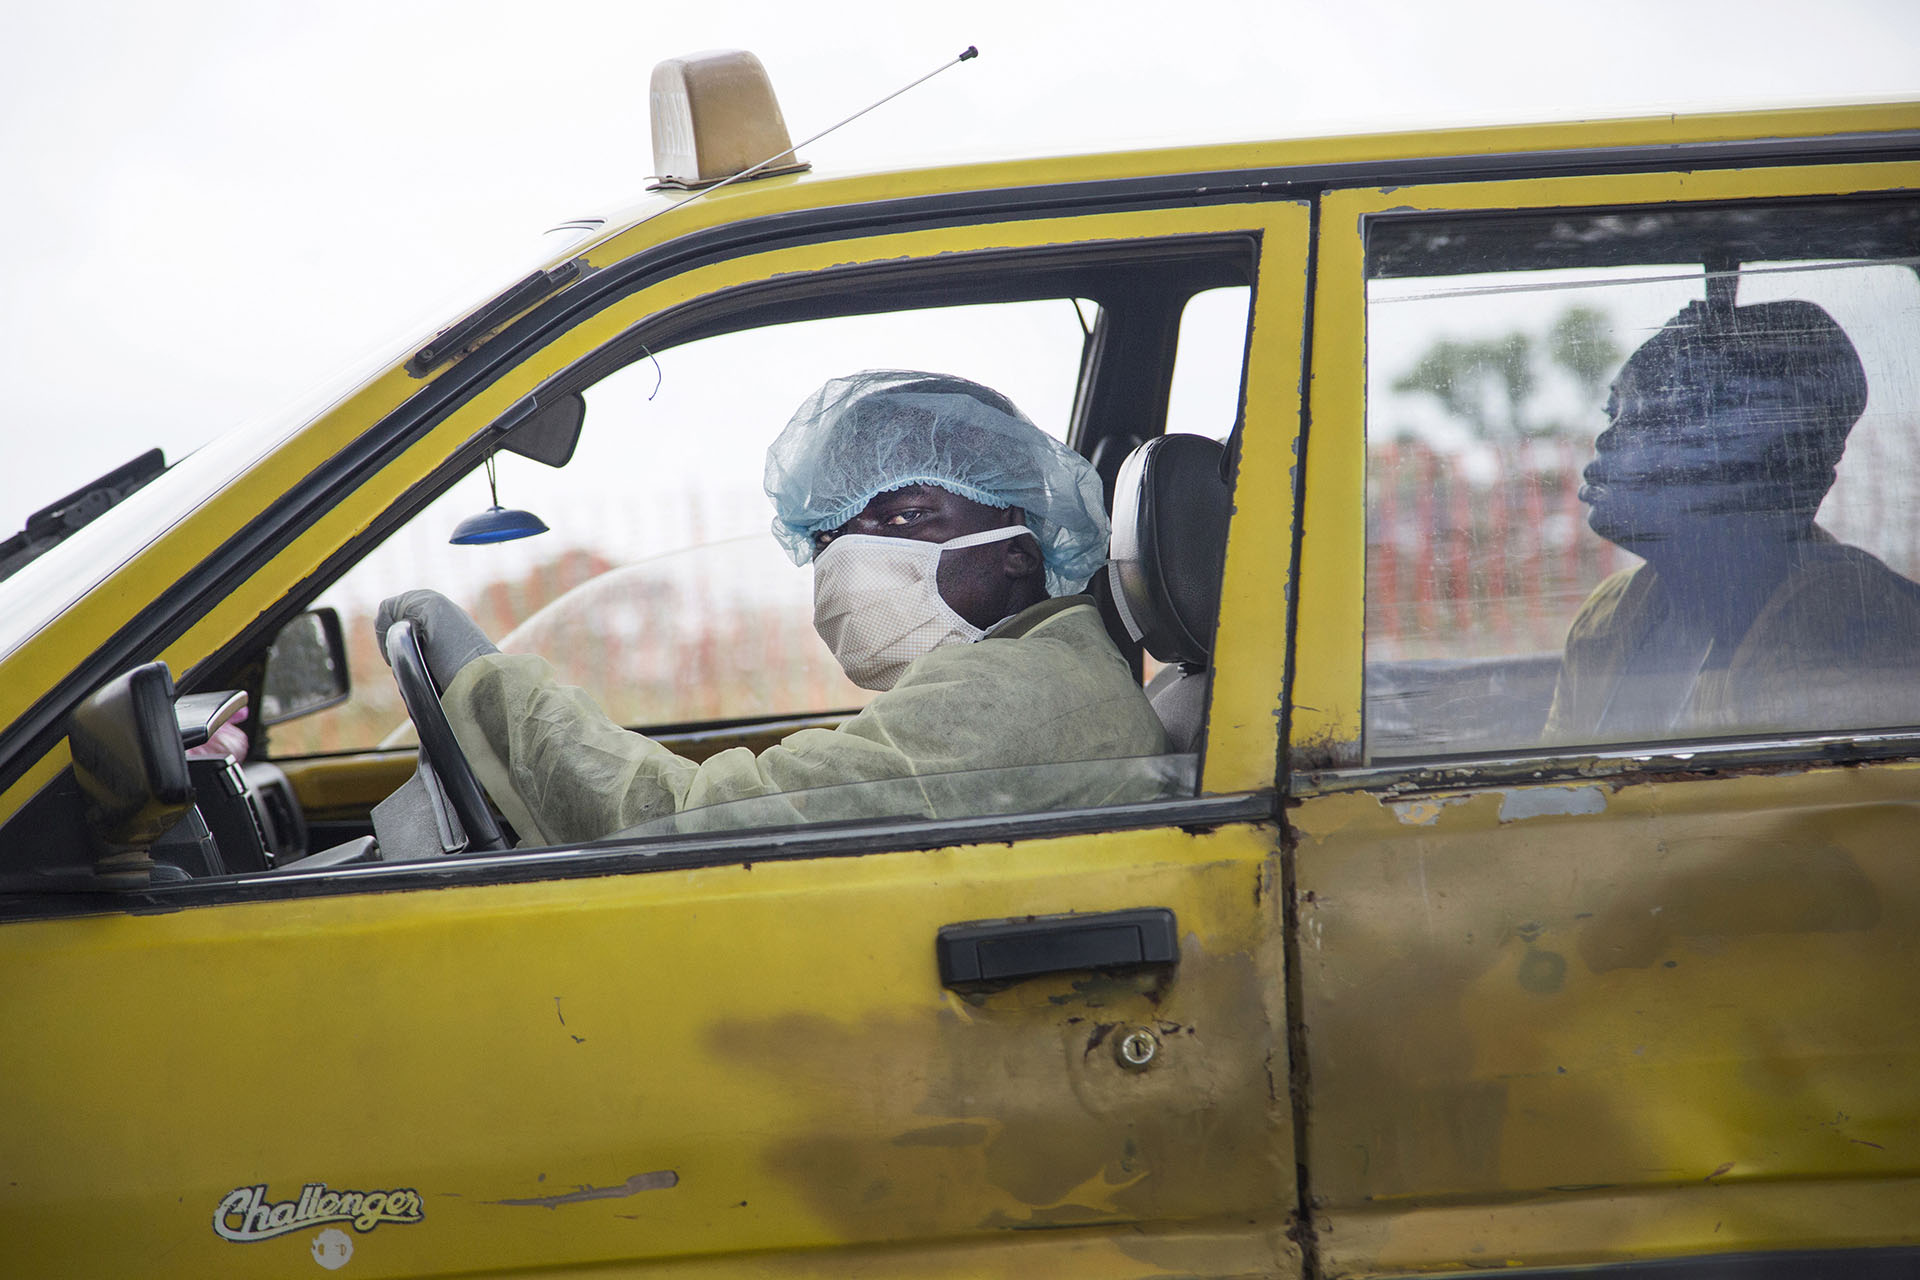 http://mashable.com/2014/10/24/ebola-liberia-hell-photographer/